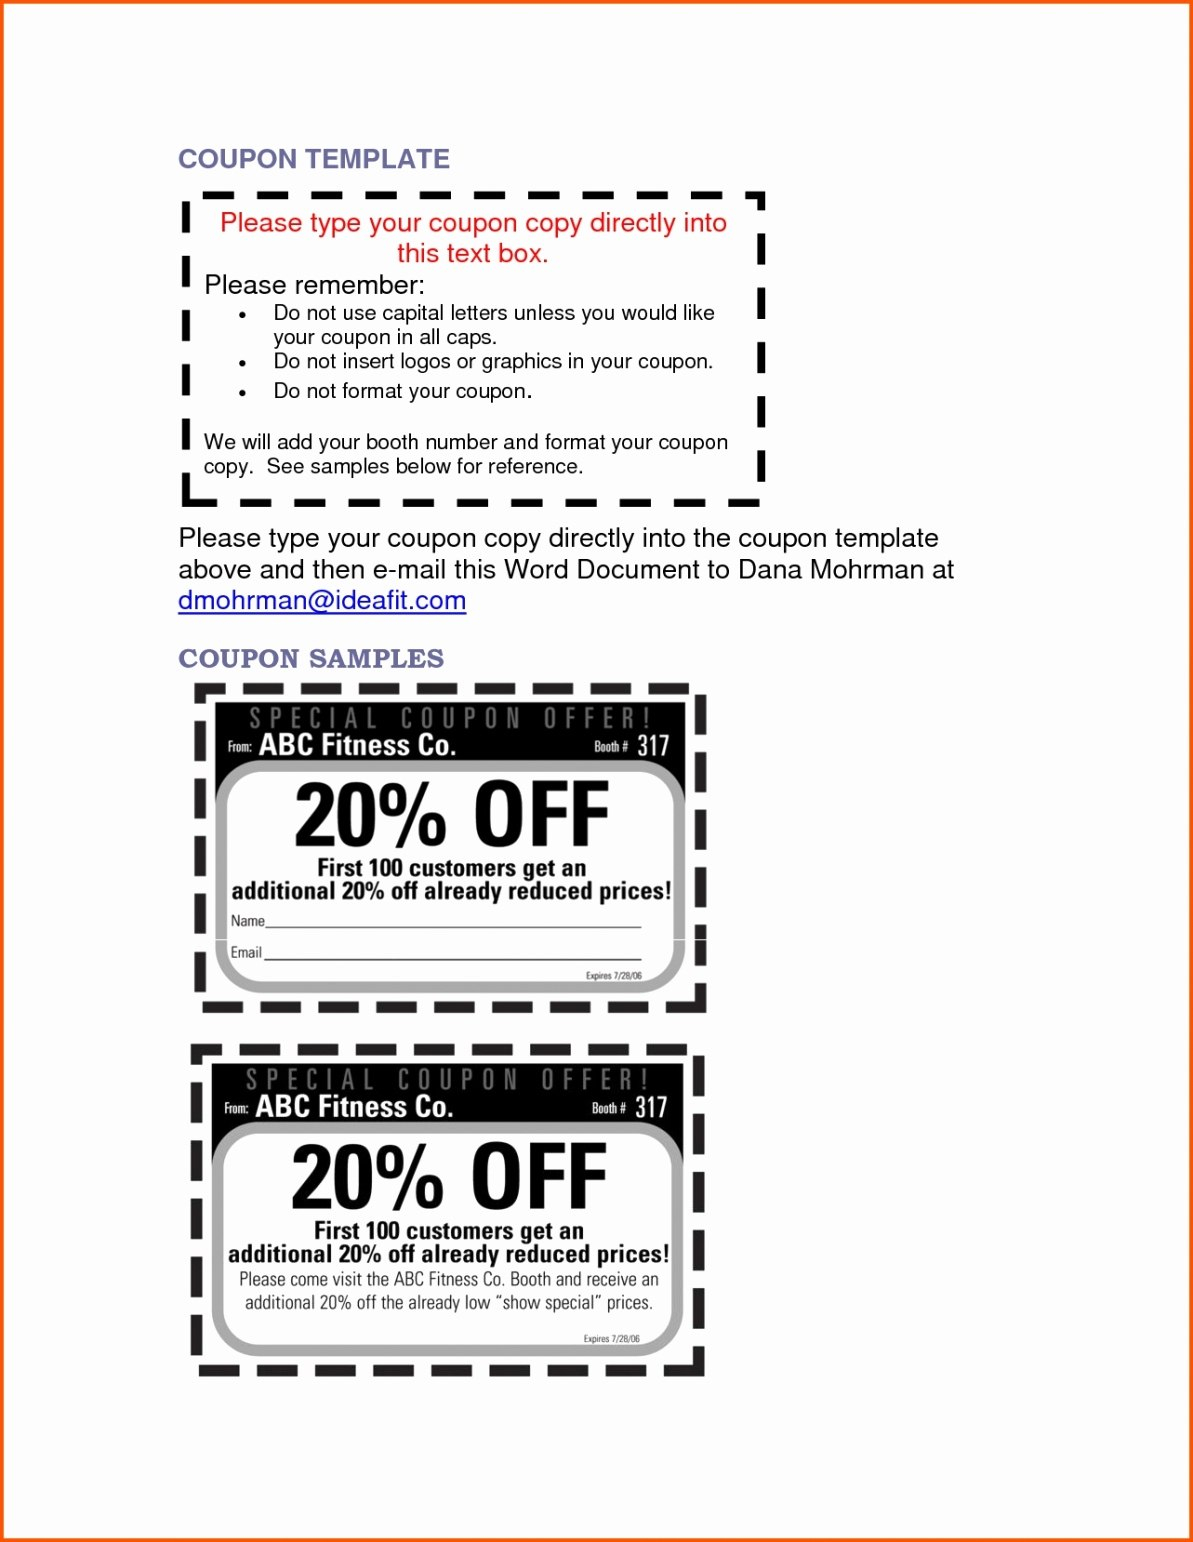 Blank Business Card Template Open Office Fresh Open Fice Certificate With Business Card Template Open Office